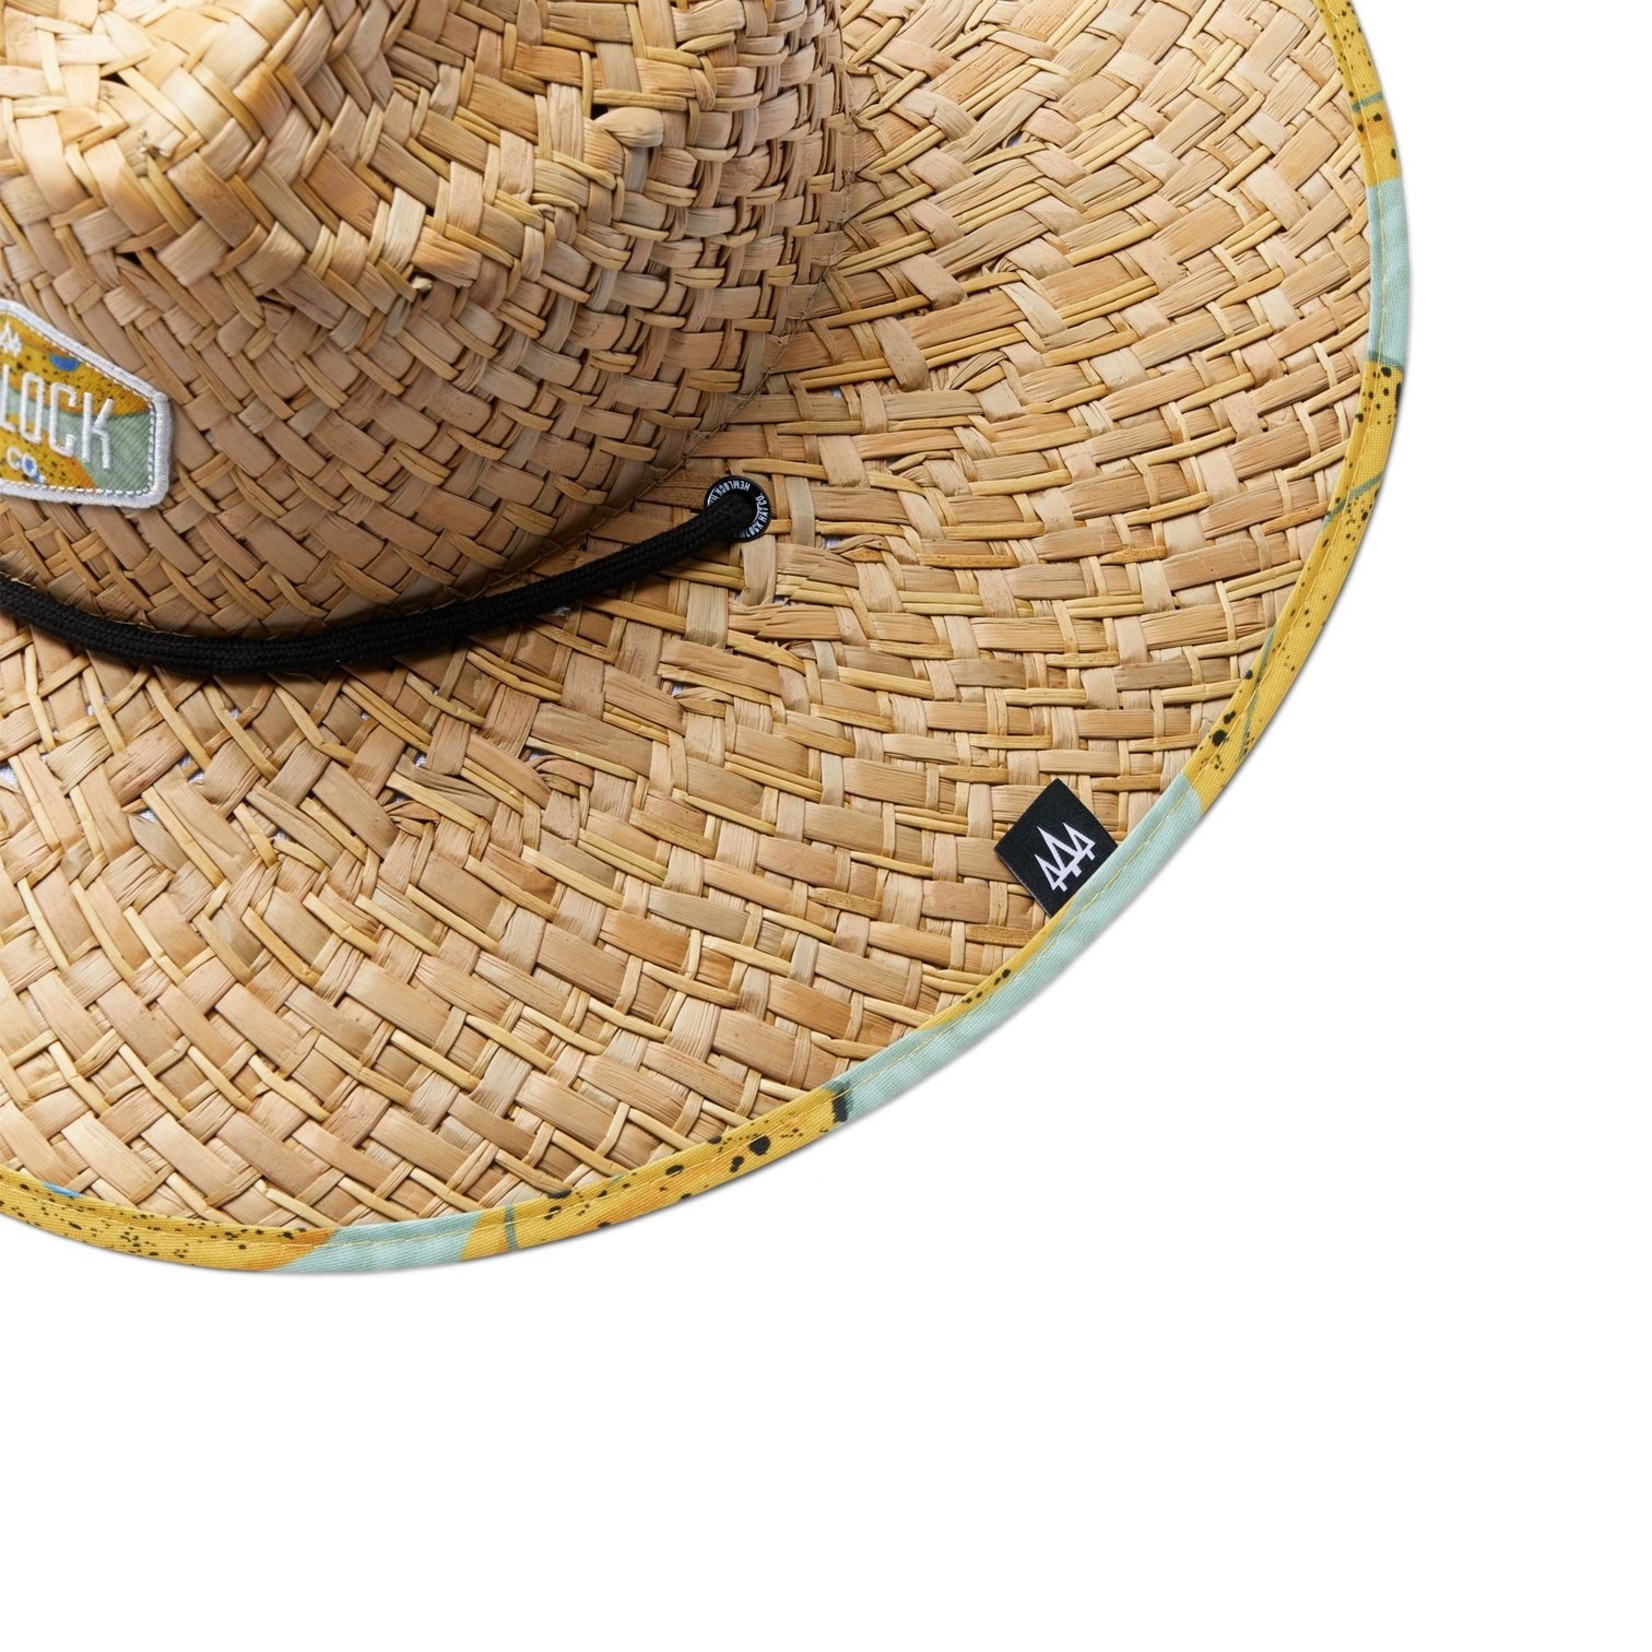 Hemlock Hat Co. Hemlock Hat Co. - Peel Big Kids